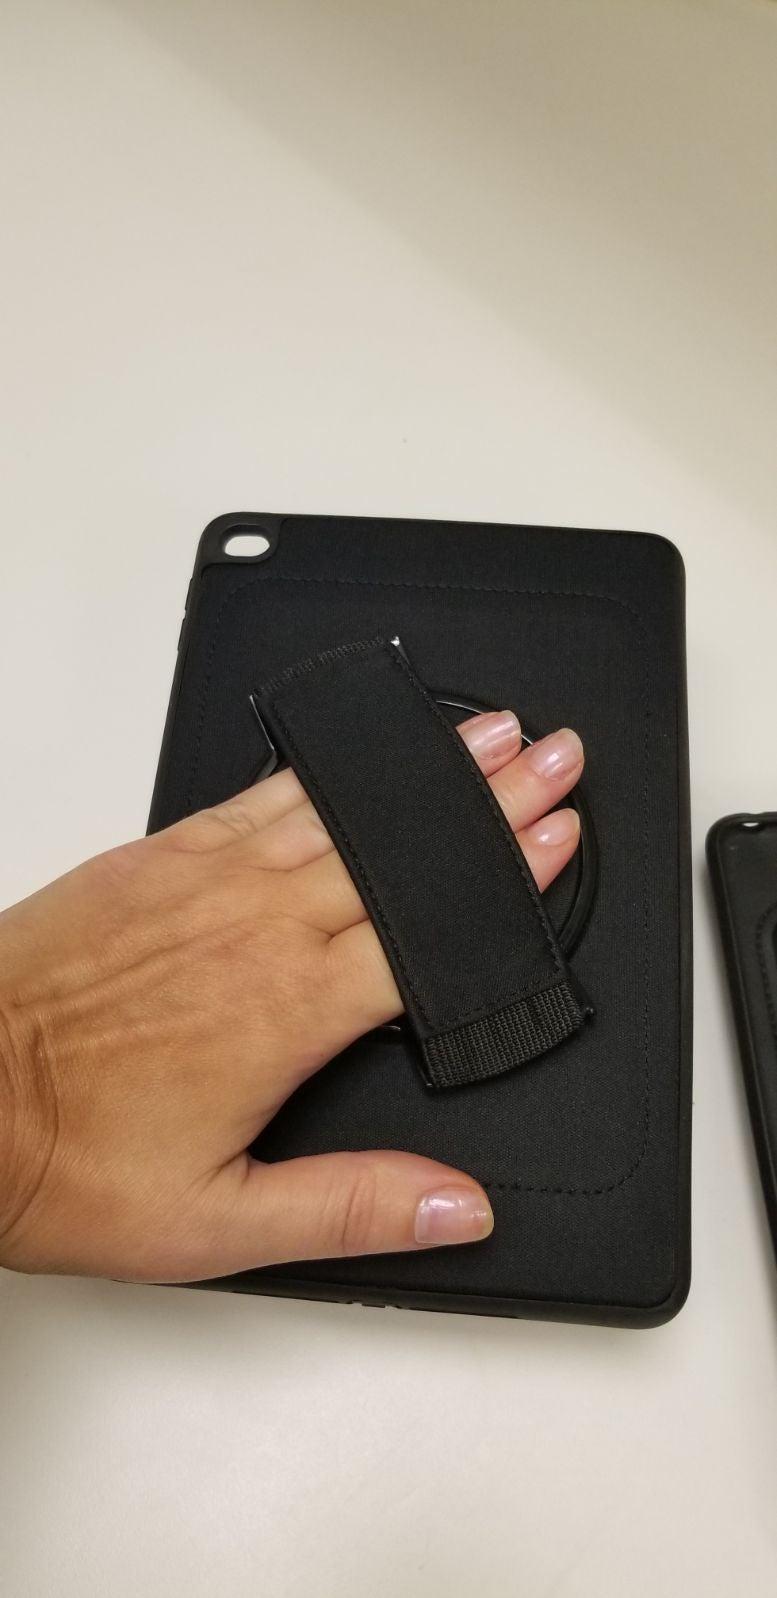 2 Air strap 360 I pad cases